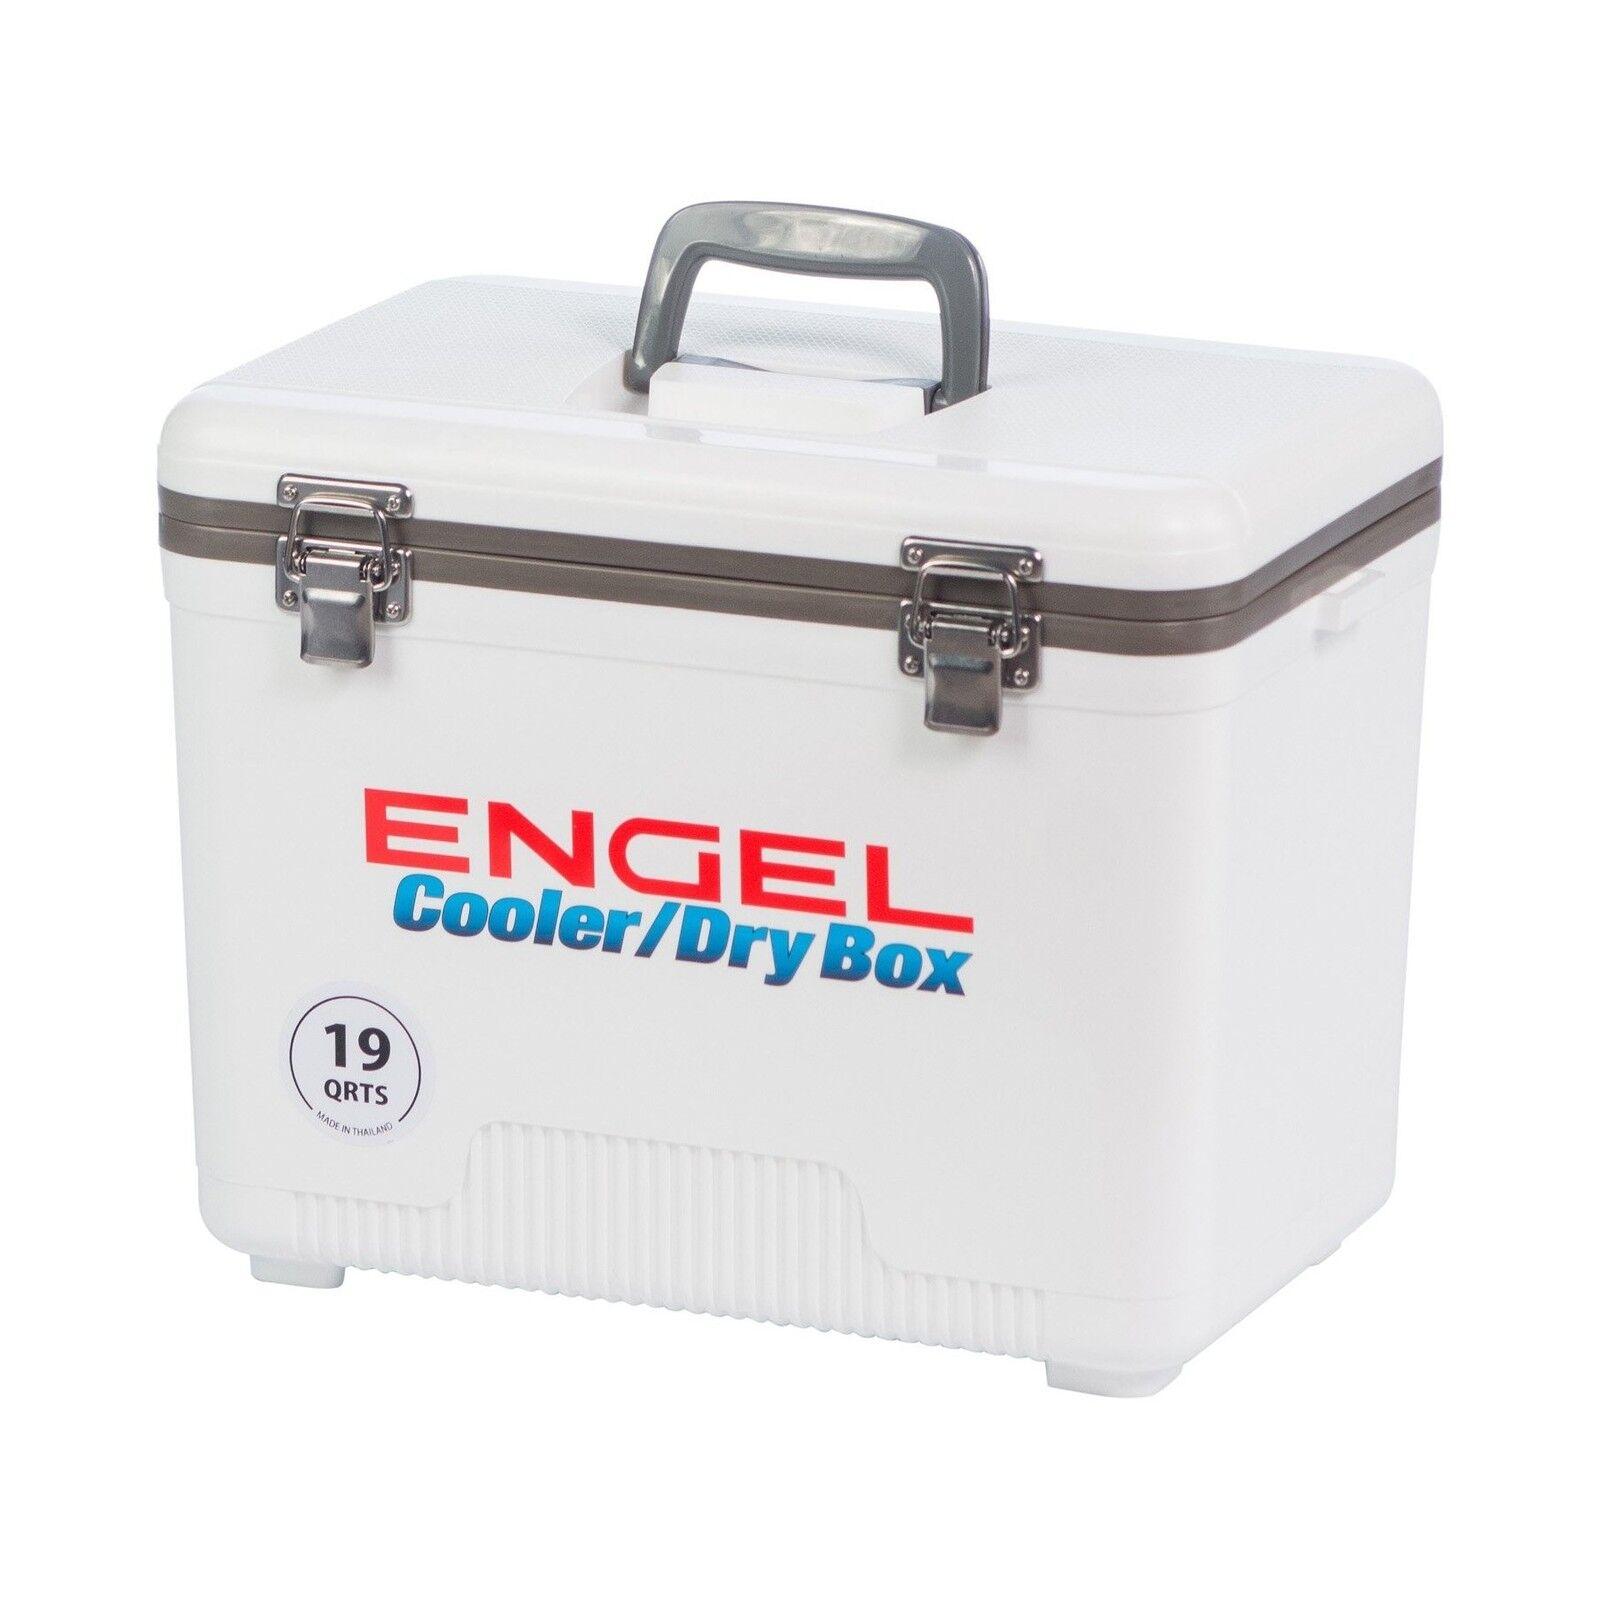 ENGEL USA Cooler Dry  Box 19 Quart White Free Shipping  new listing